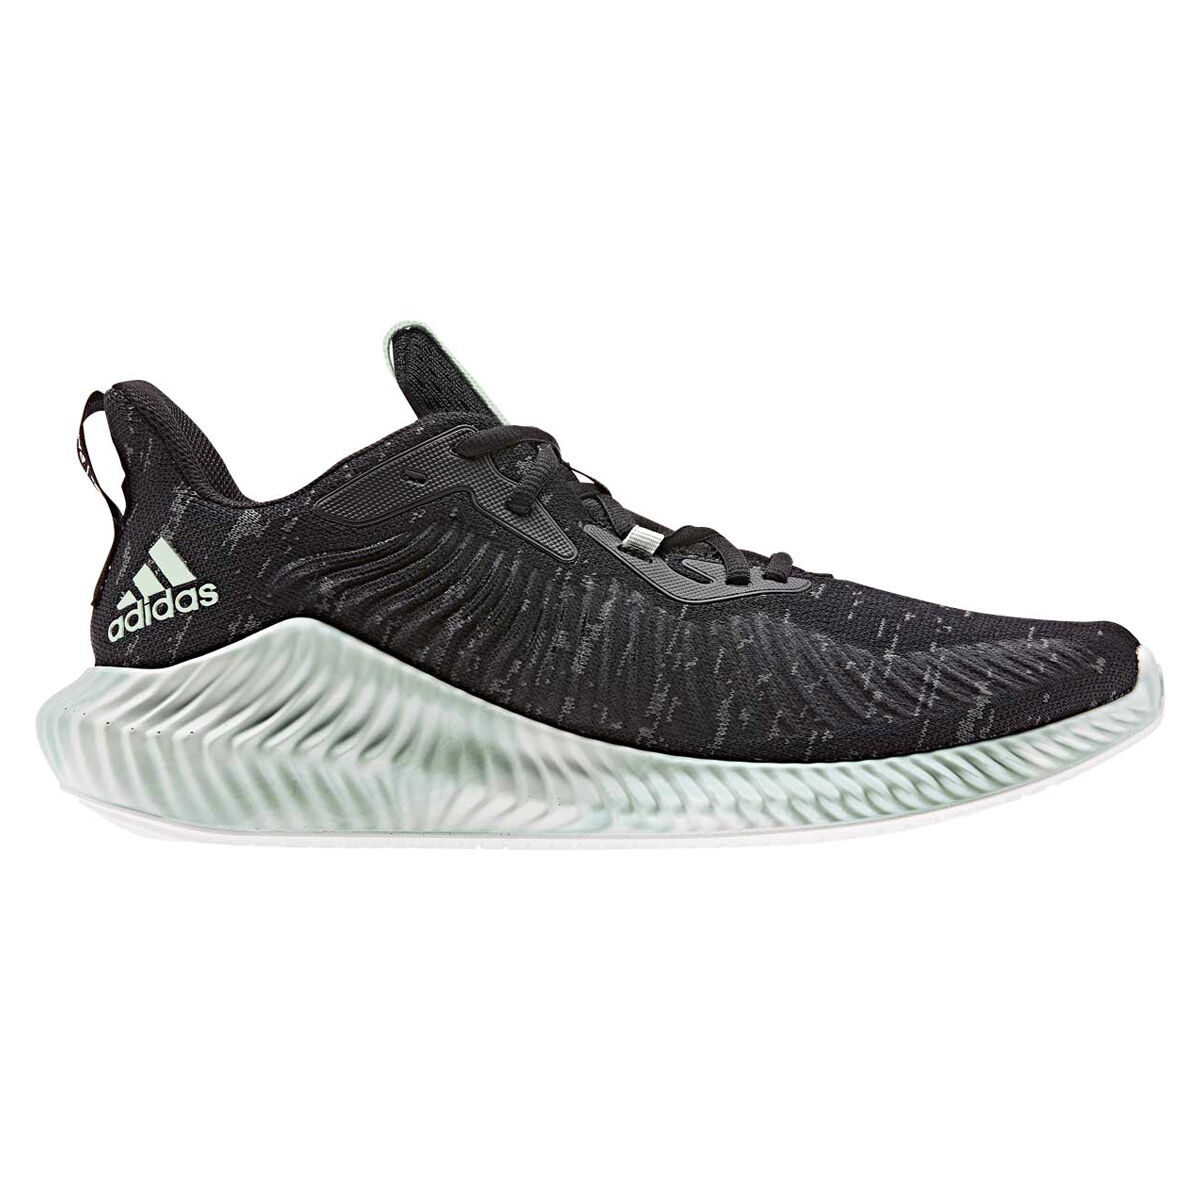 Buy adidas Alphaboost System PinkWhite Black Online